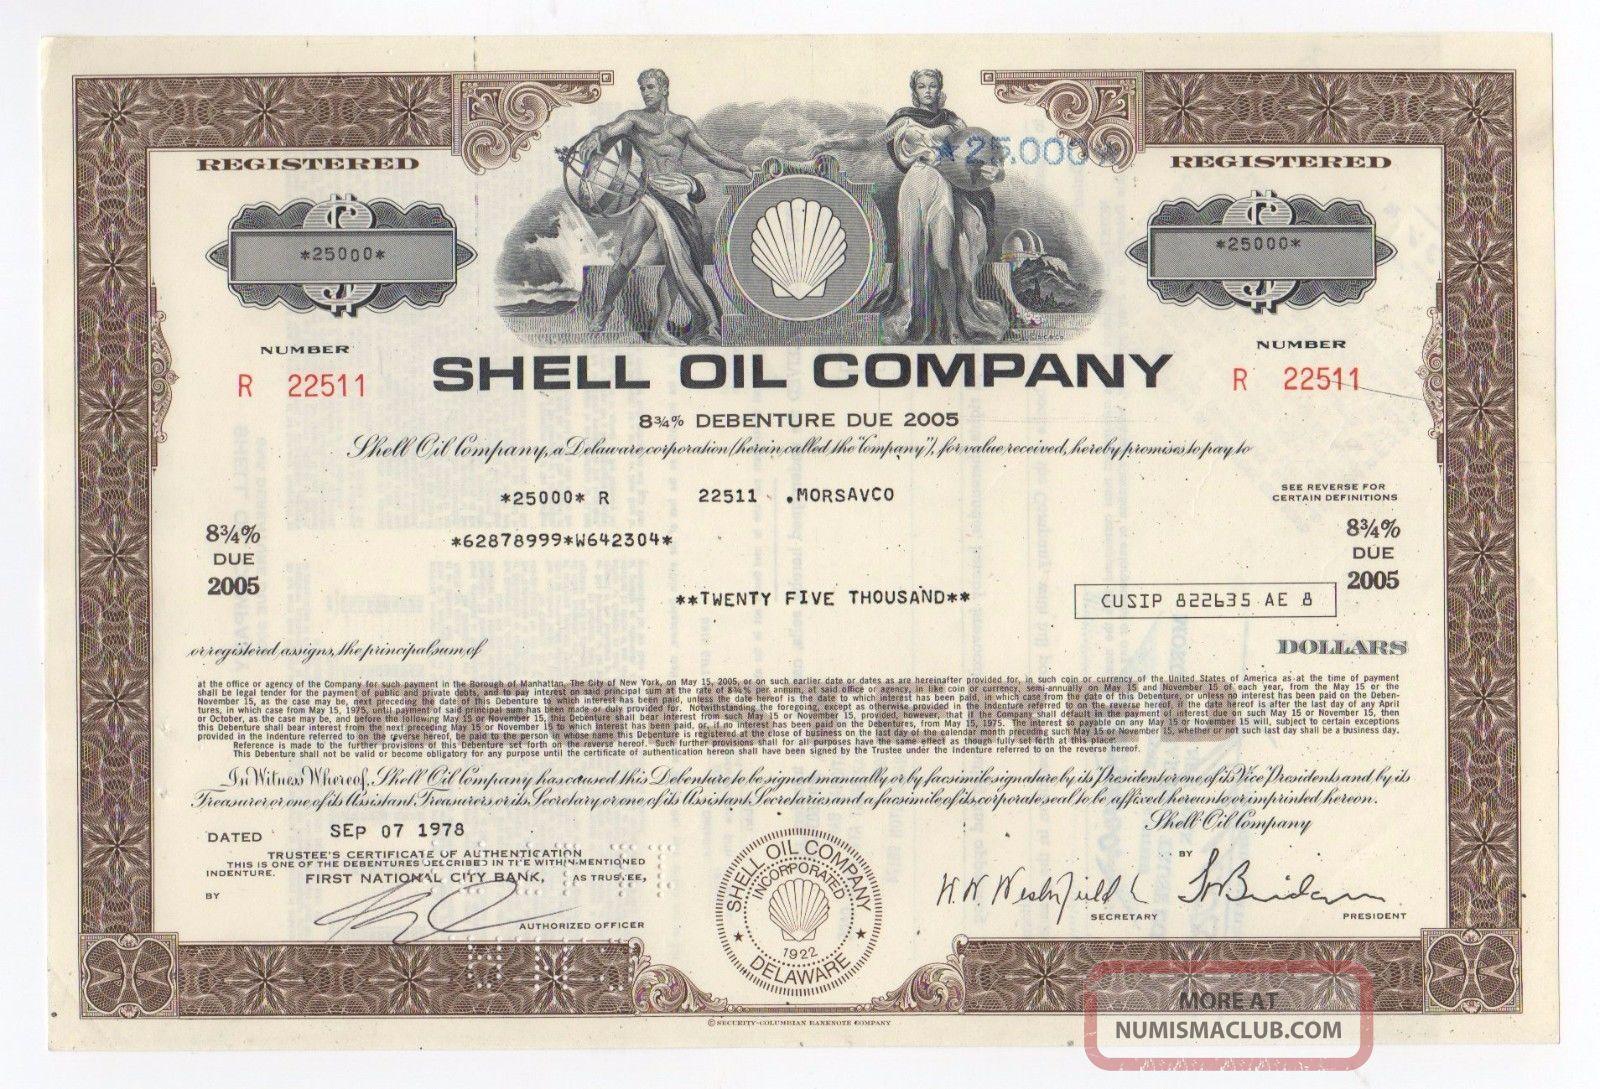 Shell Oil Company Bond W/vignette Of Man & Woman Stocks & Bonds, Scripophily photo